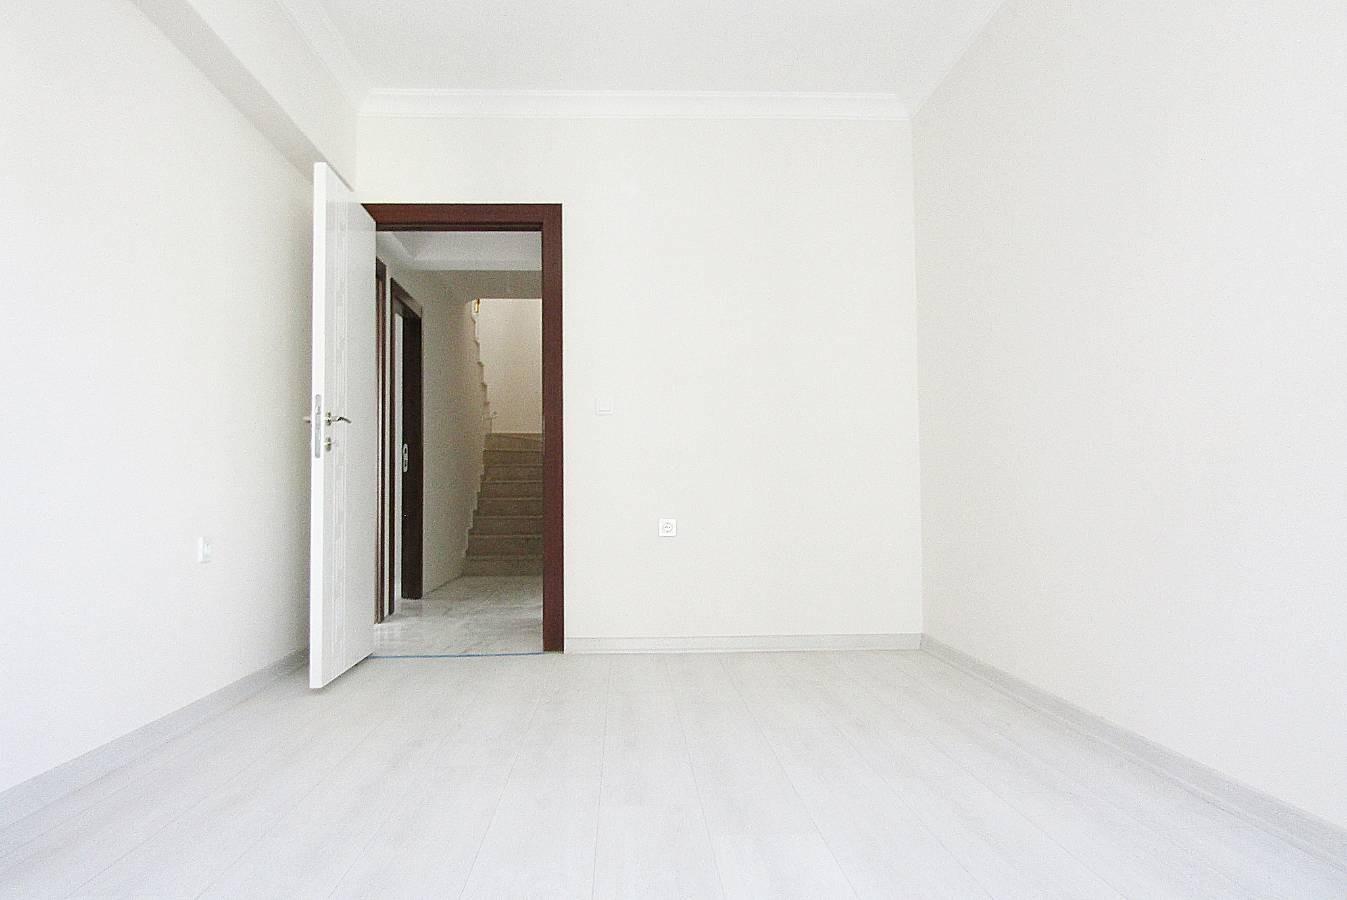 SR EMLAK'TAN İSTASYON MAH'DE 4+1 210 m² ASANSÖRLÜ FULL YAPILI TERAS DAİRE